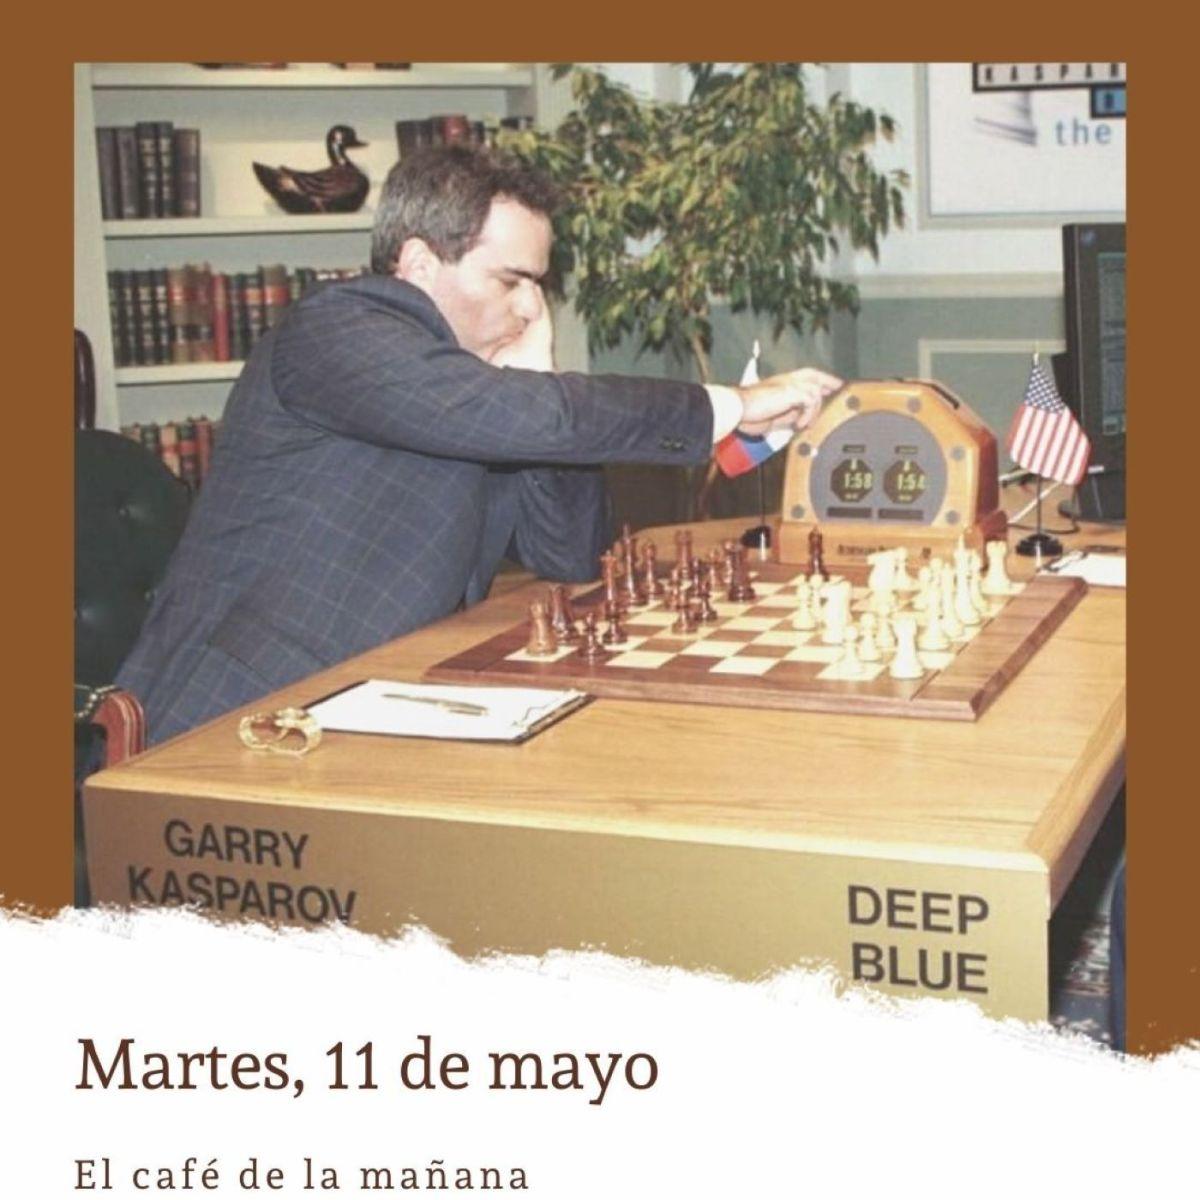 Martes, 11 de mayo. Deeper Blue derrota a Kaspárov